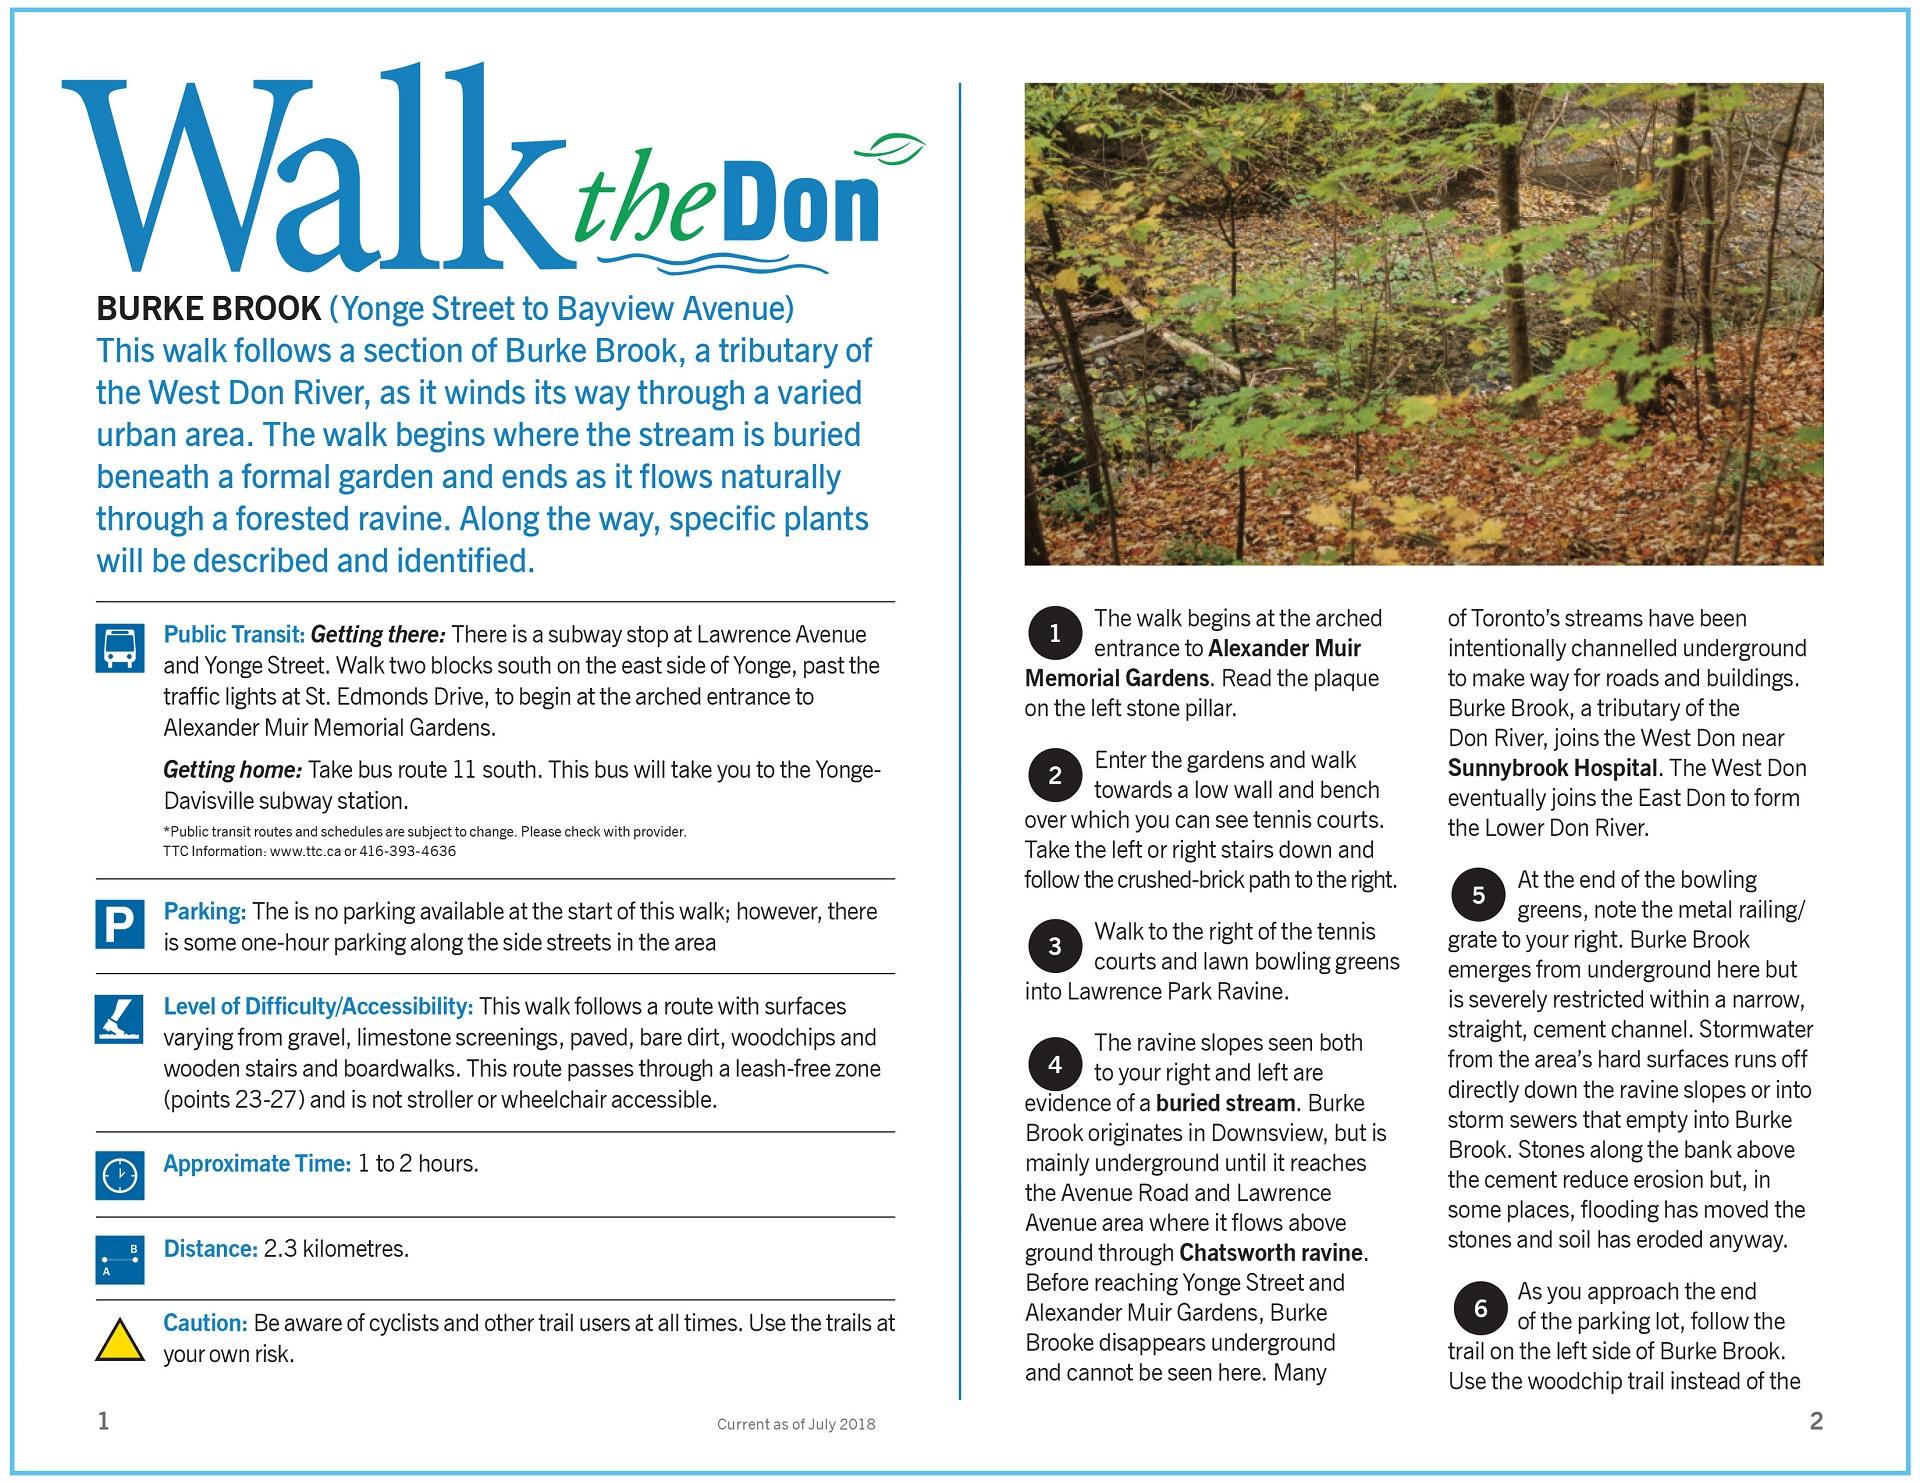 Walk the Don - Burke Brook Trail Guide